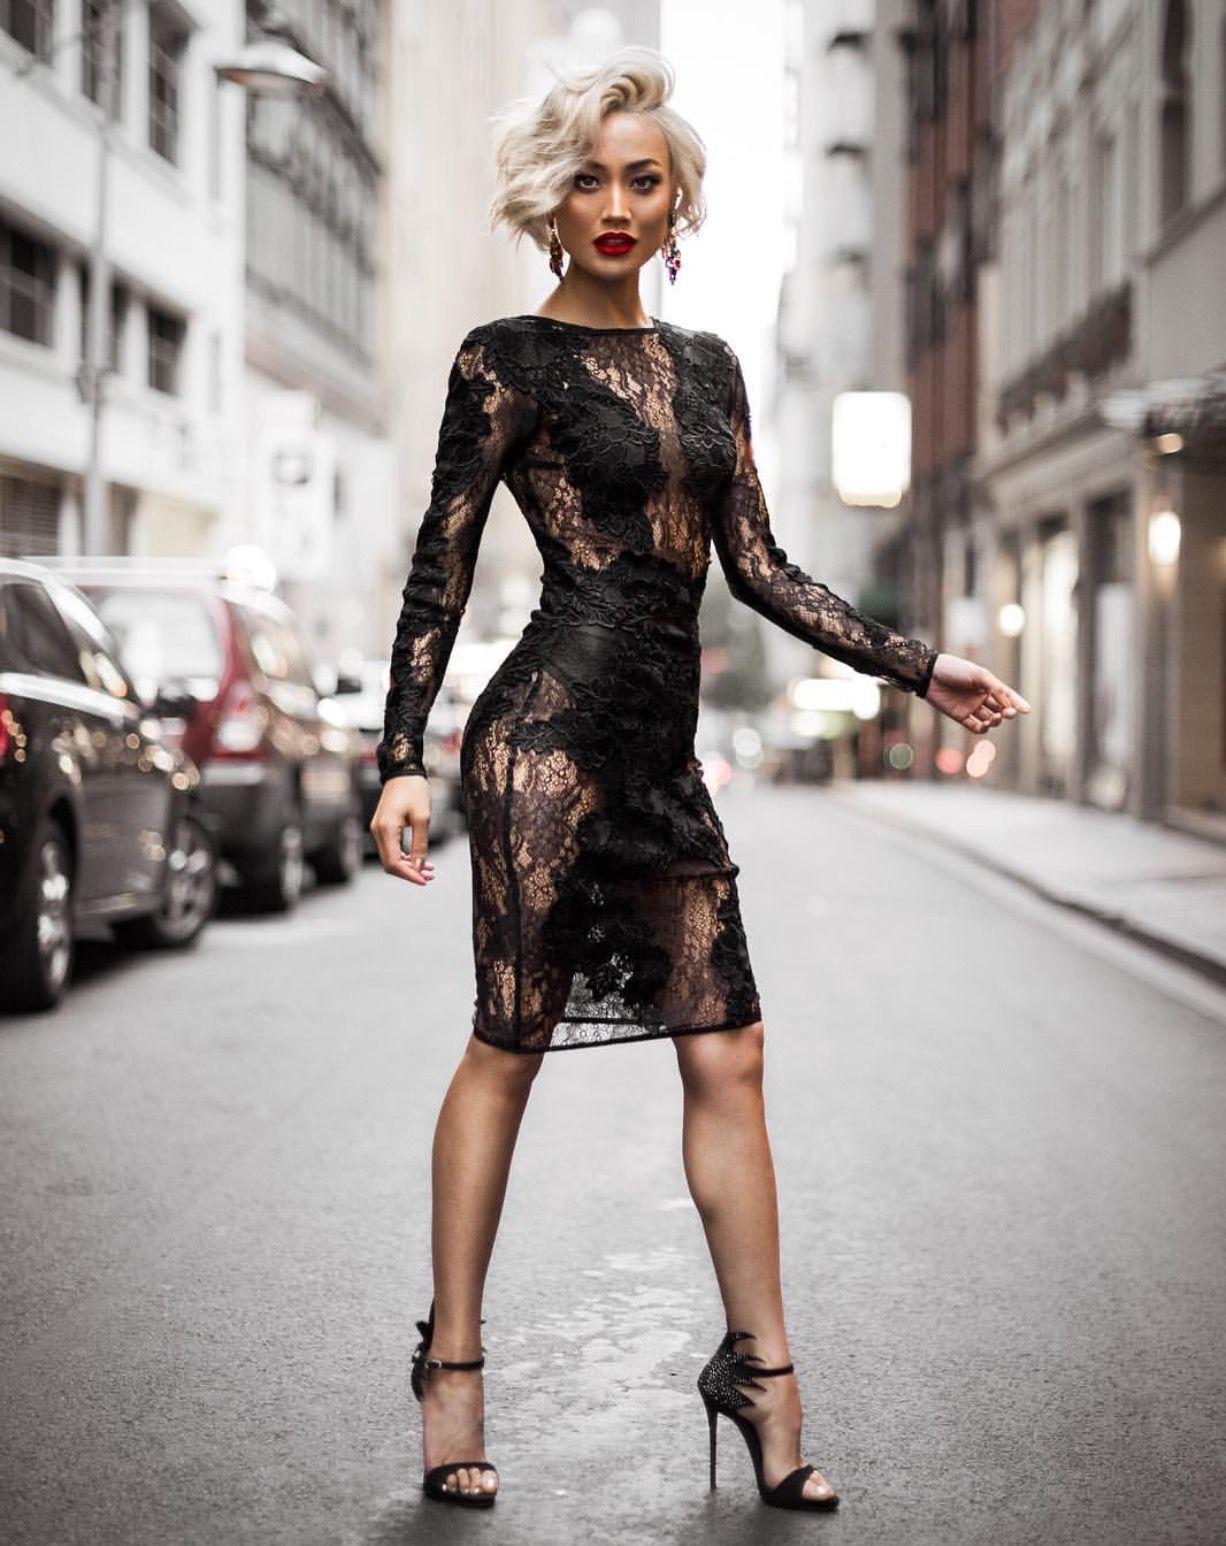 Sexy Women Lingerie Latex Leather Wet Look Short Mini Dress